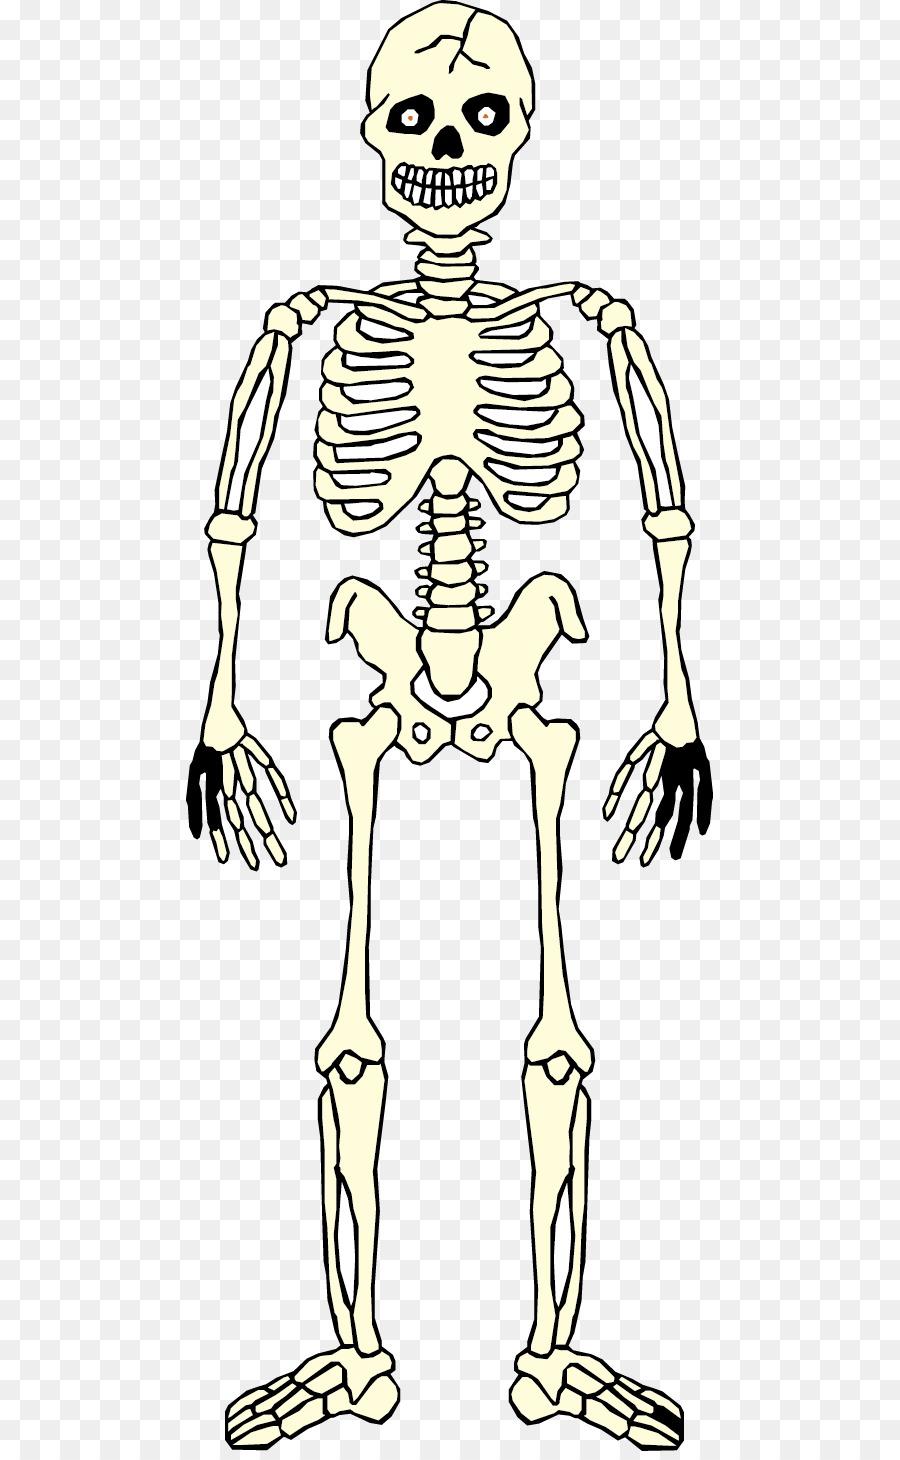 Homo Sapiens Skeleton Hand Human Anatomy Human Body Human Skull